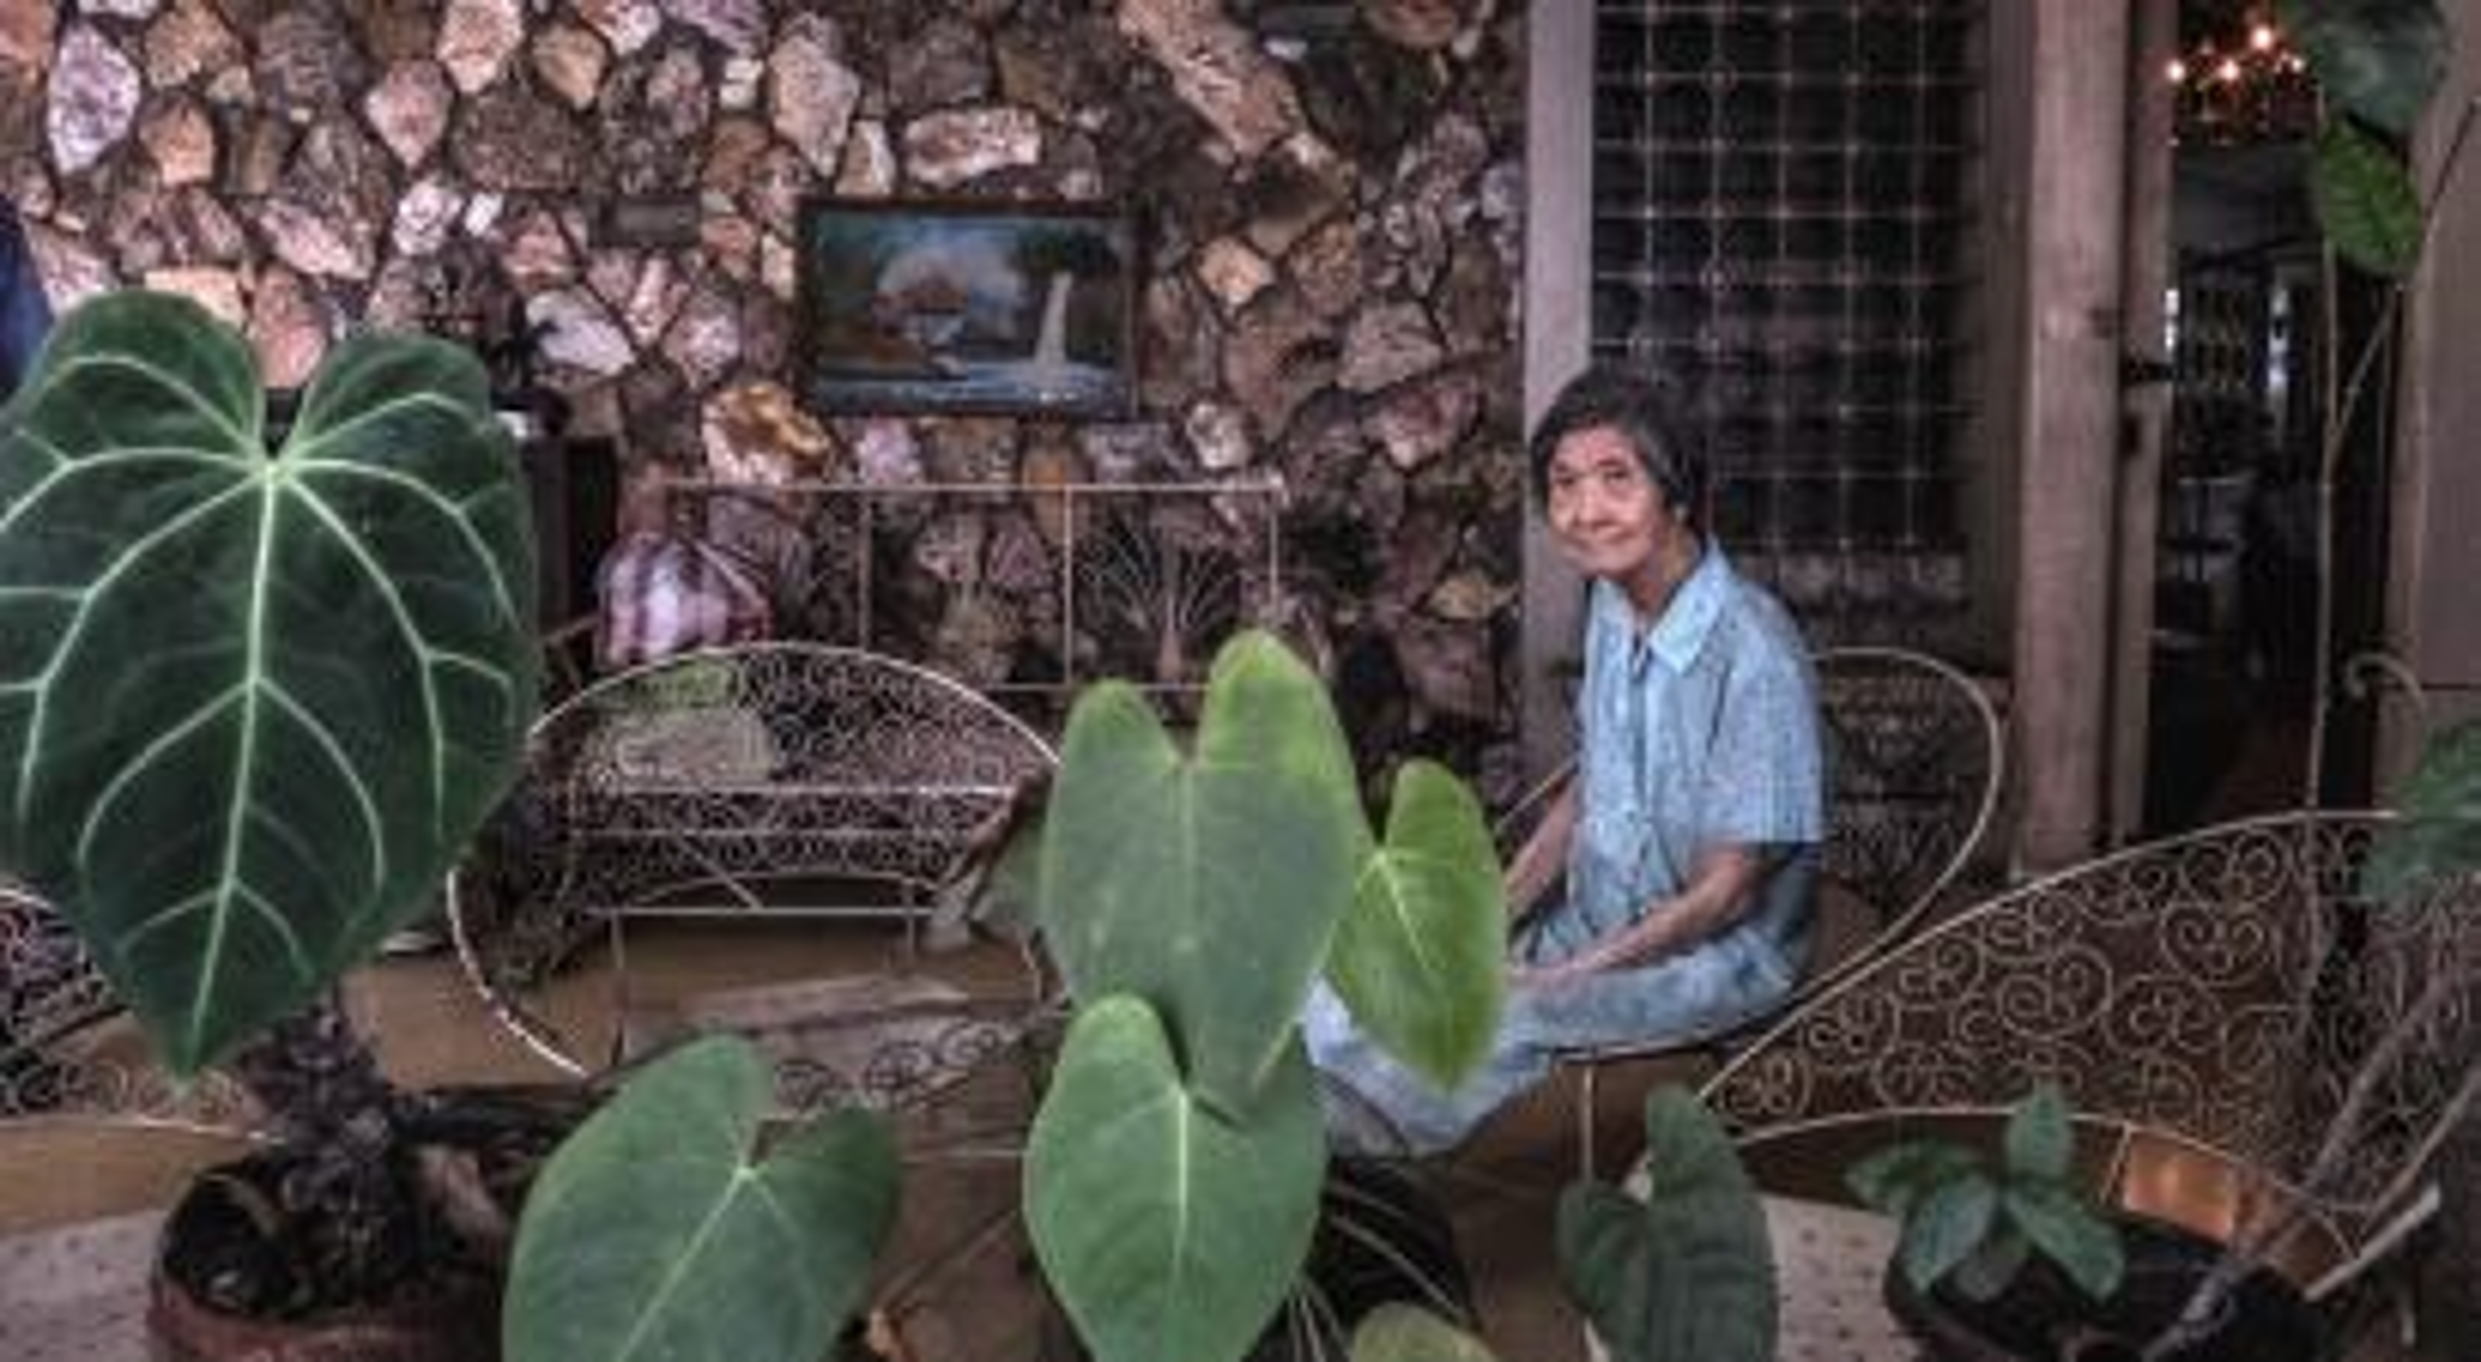 Emerita Quito: The greatest forgotten Filipino philosopher has died